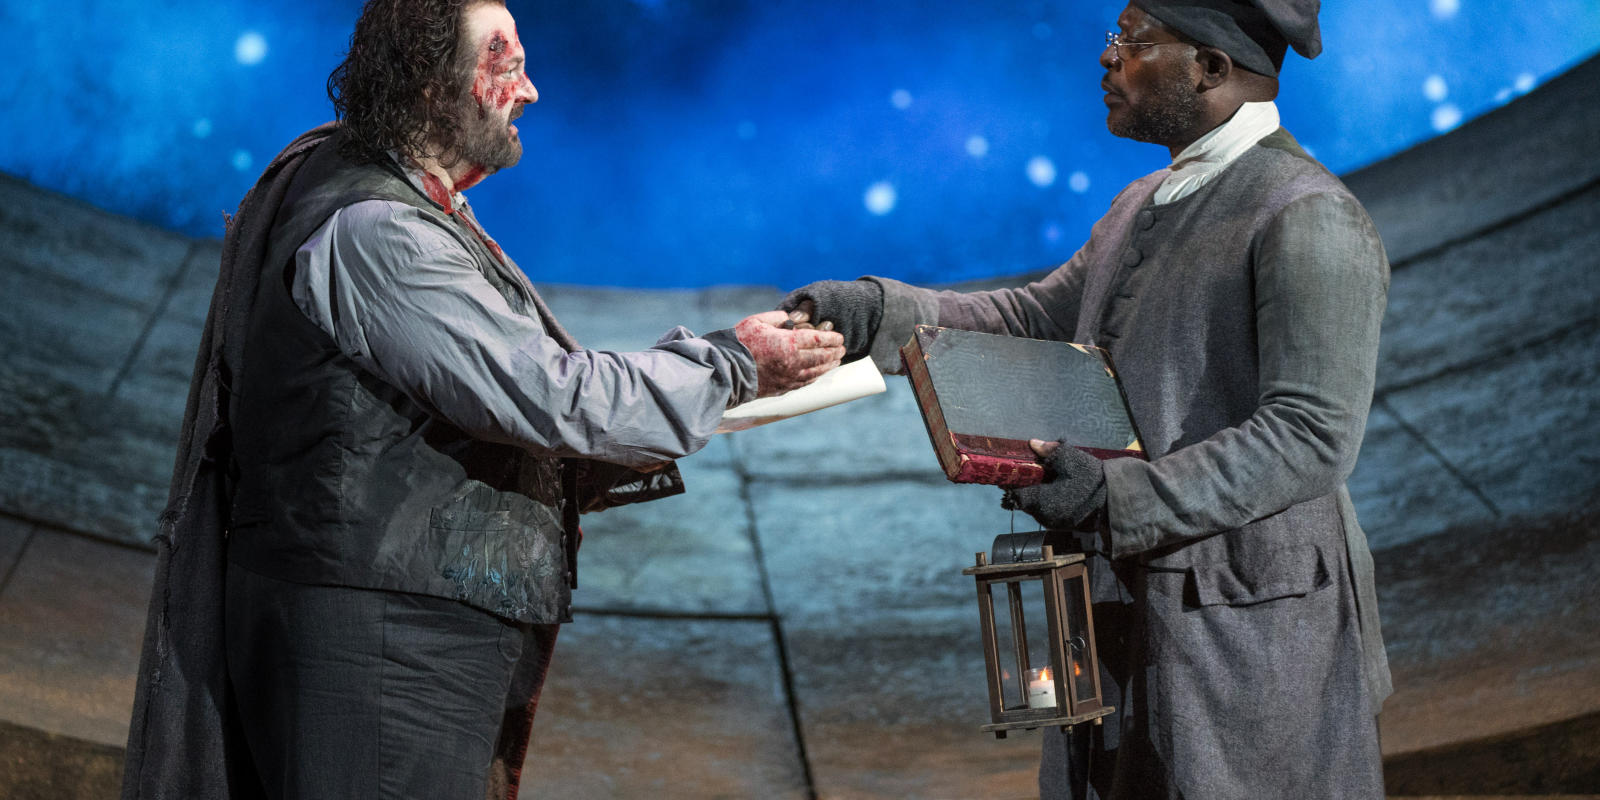 Gwyn Hughes Jones as Cavaradossi and Robert Winslade Anderson as Gaoler